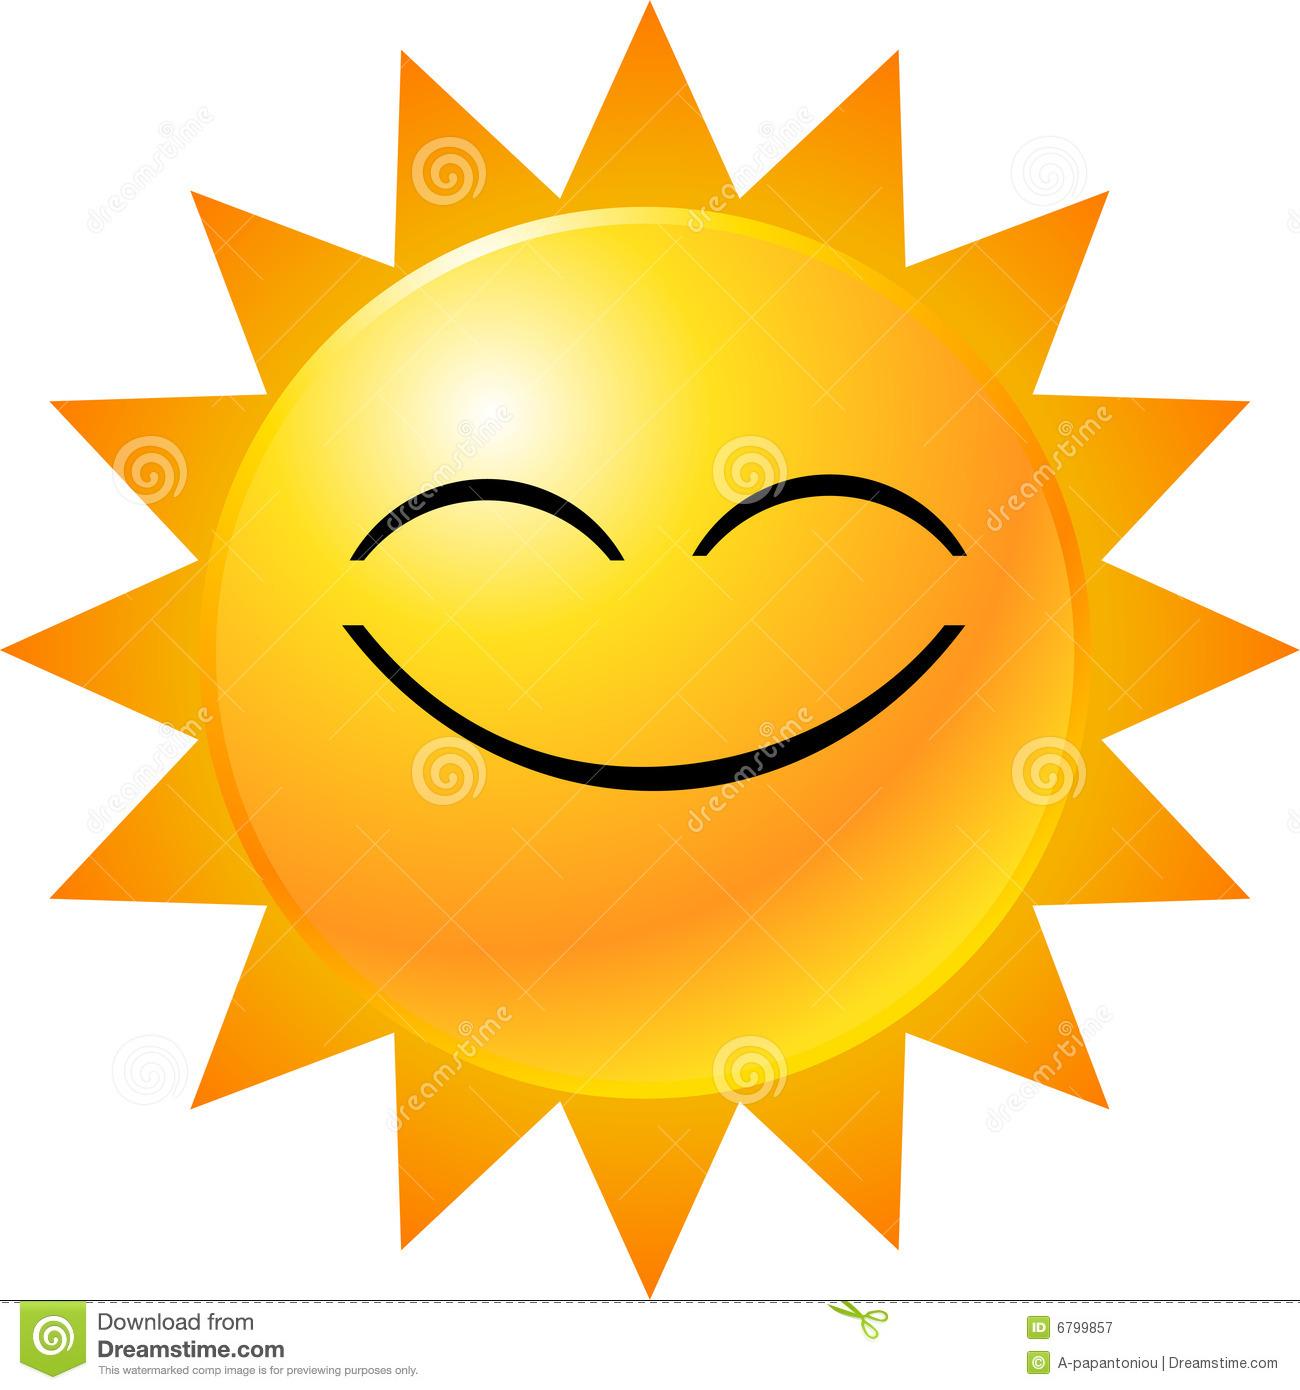 Sunny clipart s sunny.  clip art clipartlook